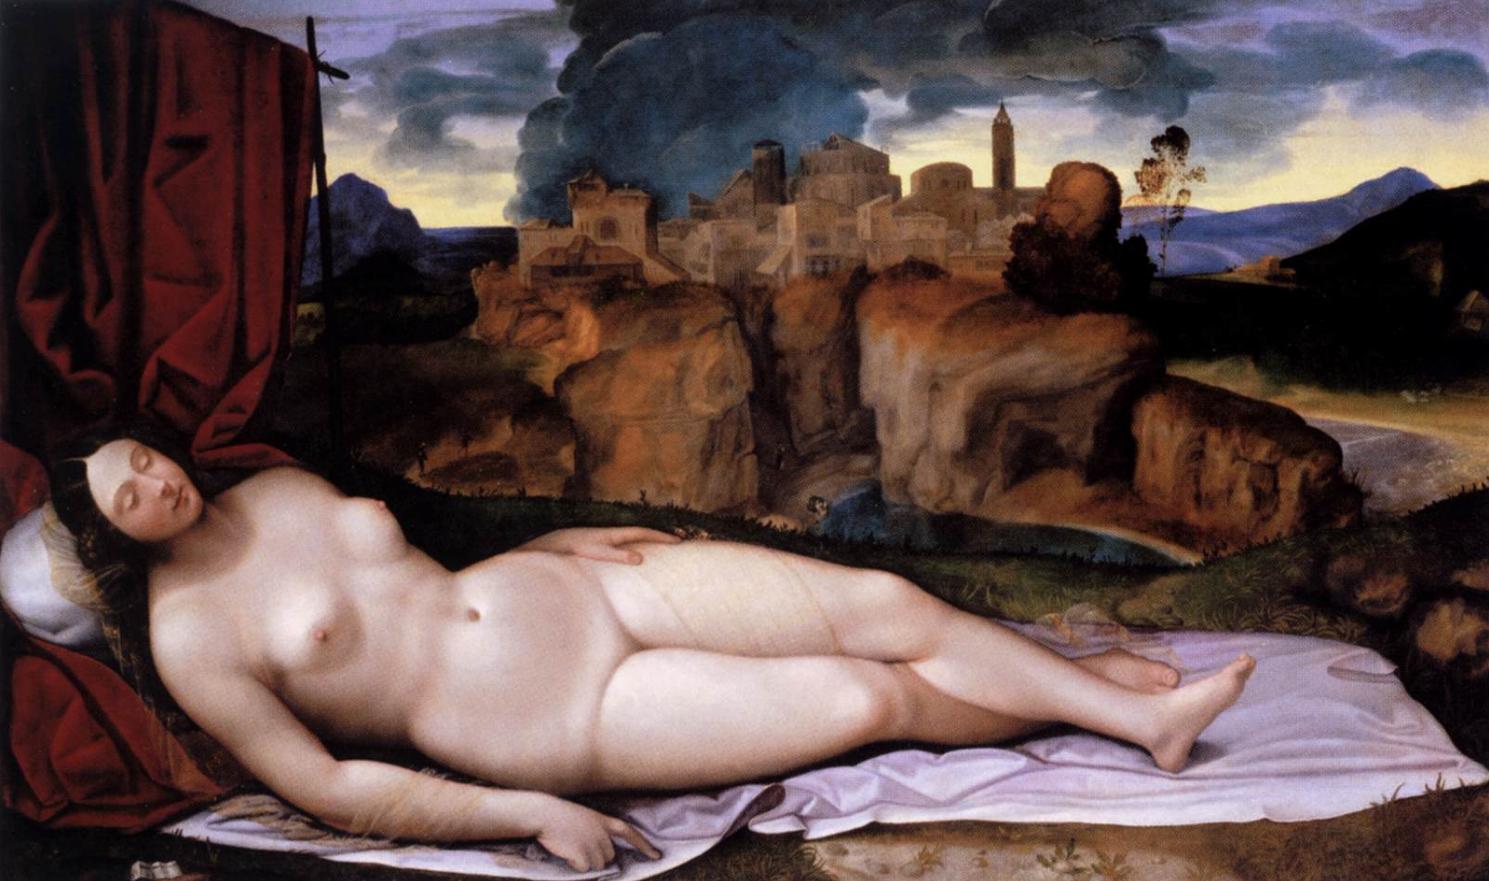 Girolamo da Treviso, Sleeping Venus, 1520